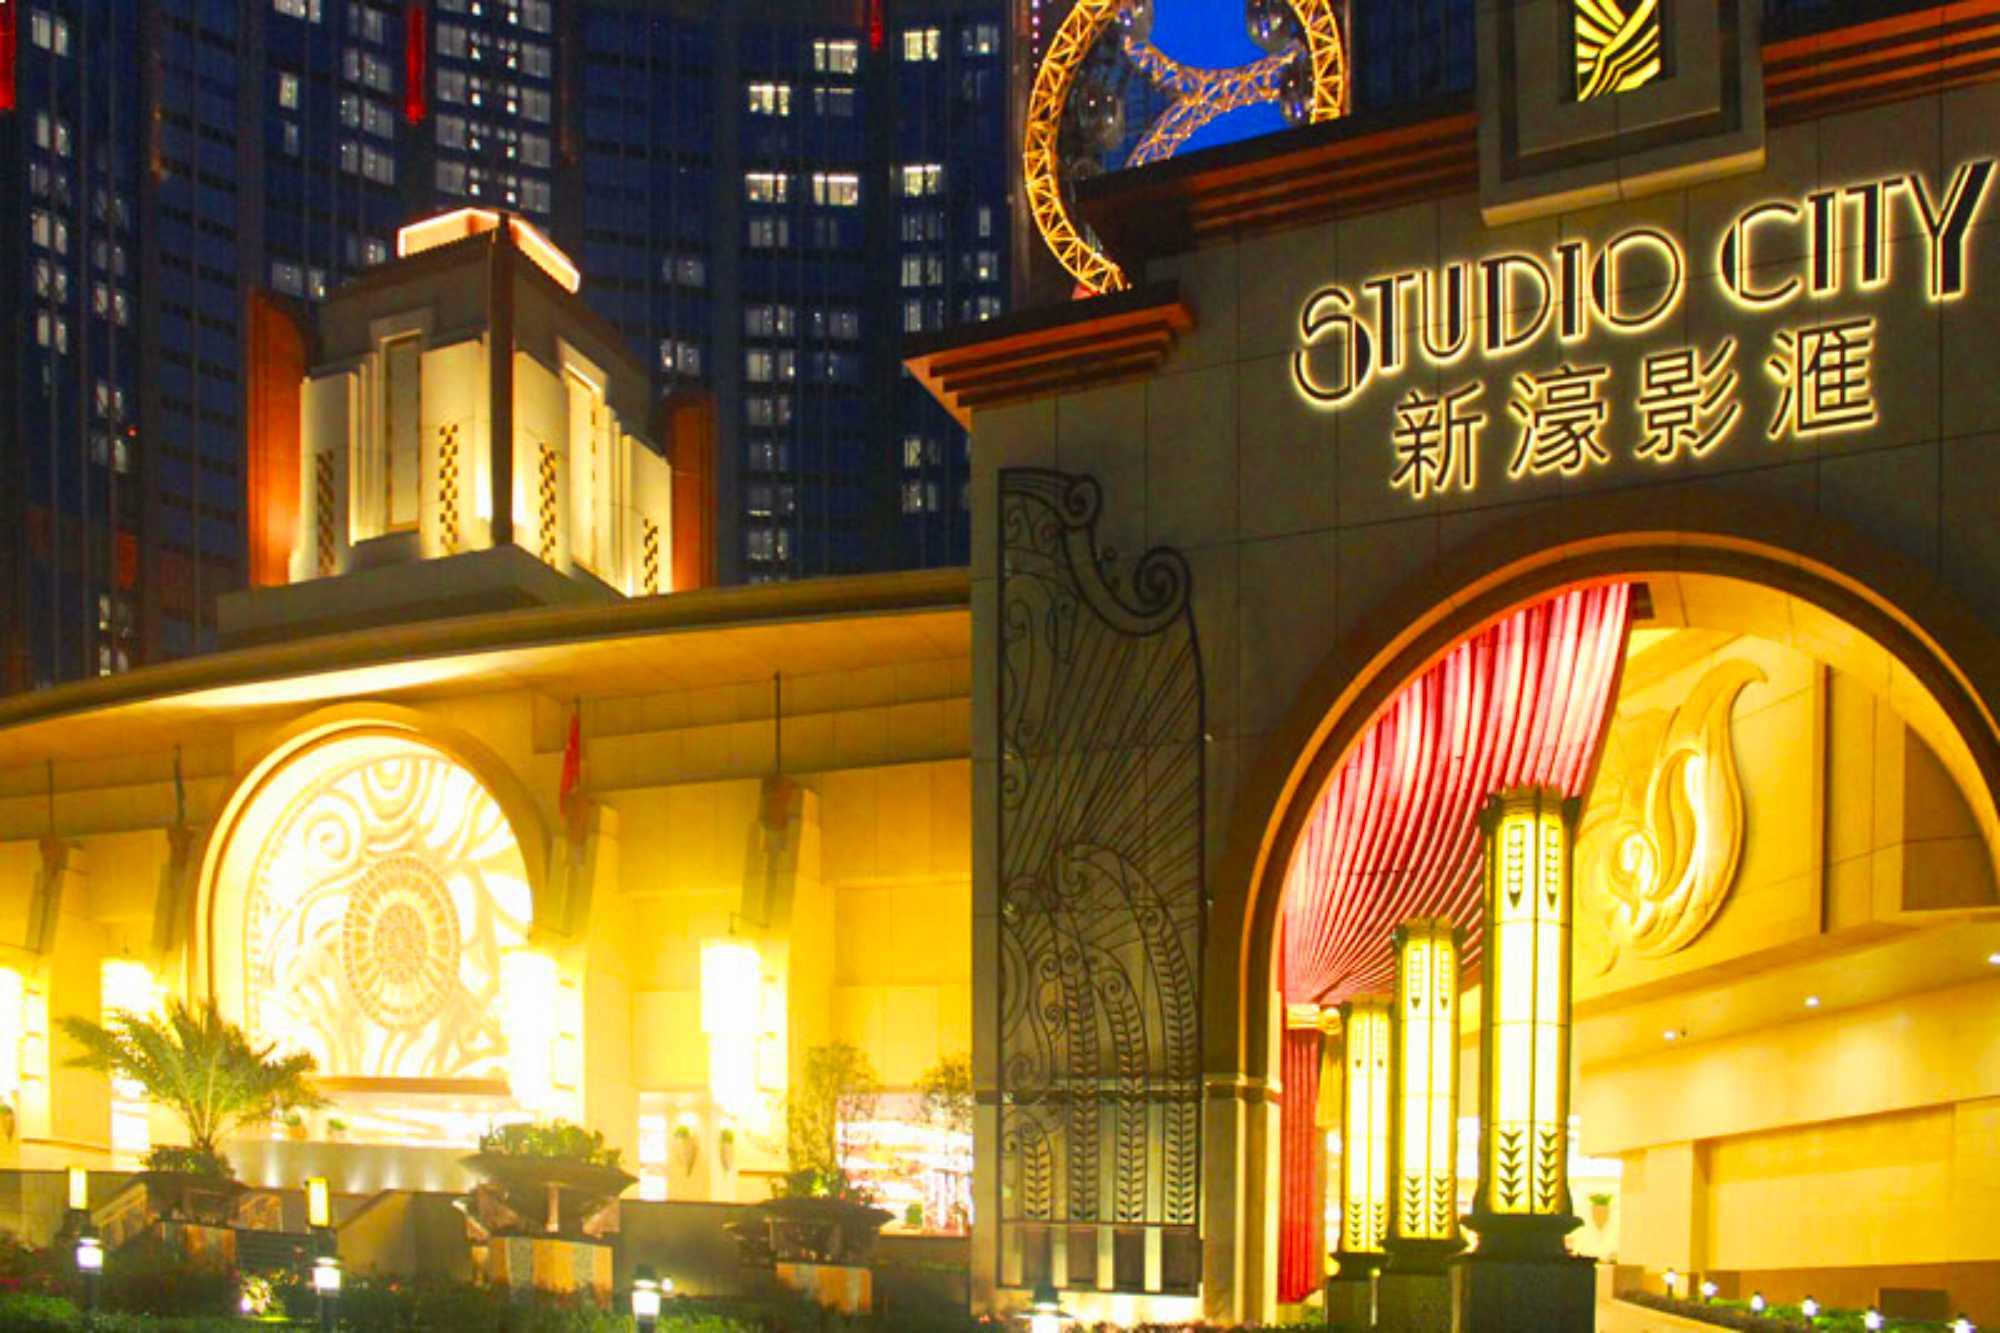 Macau Studio City